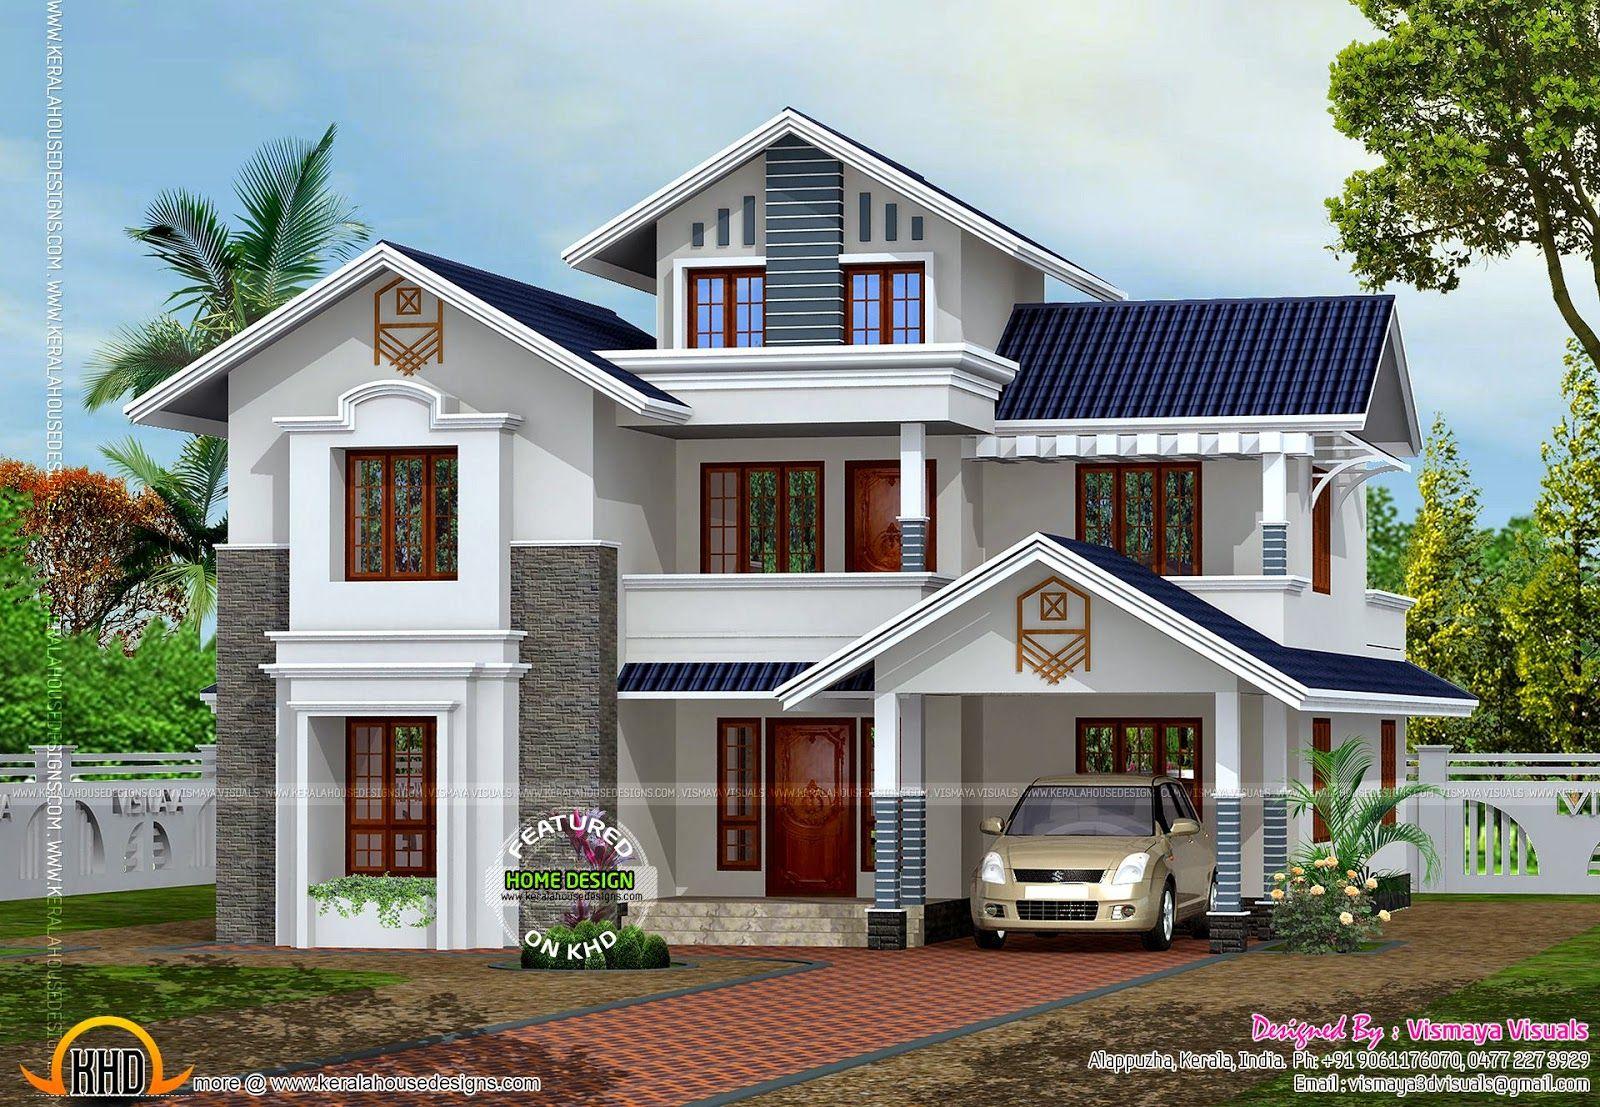 Pin by arun ac on arun in pinterest house design modern